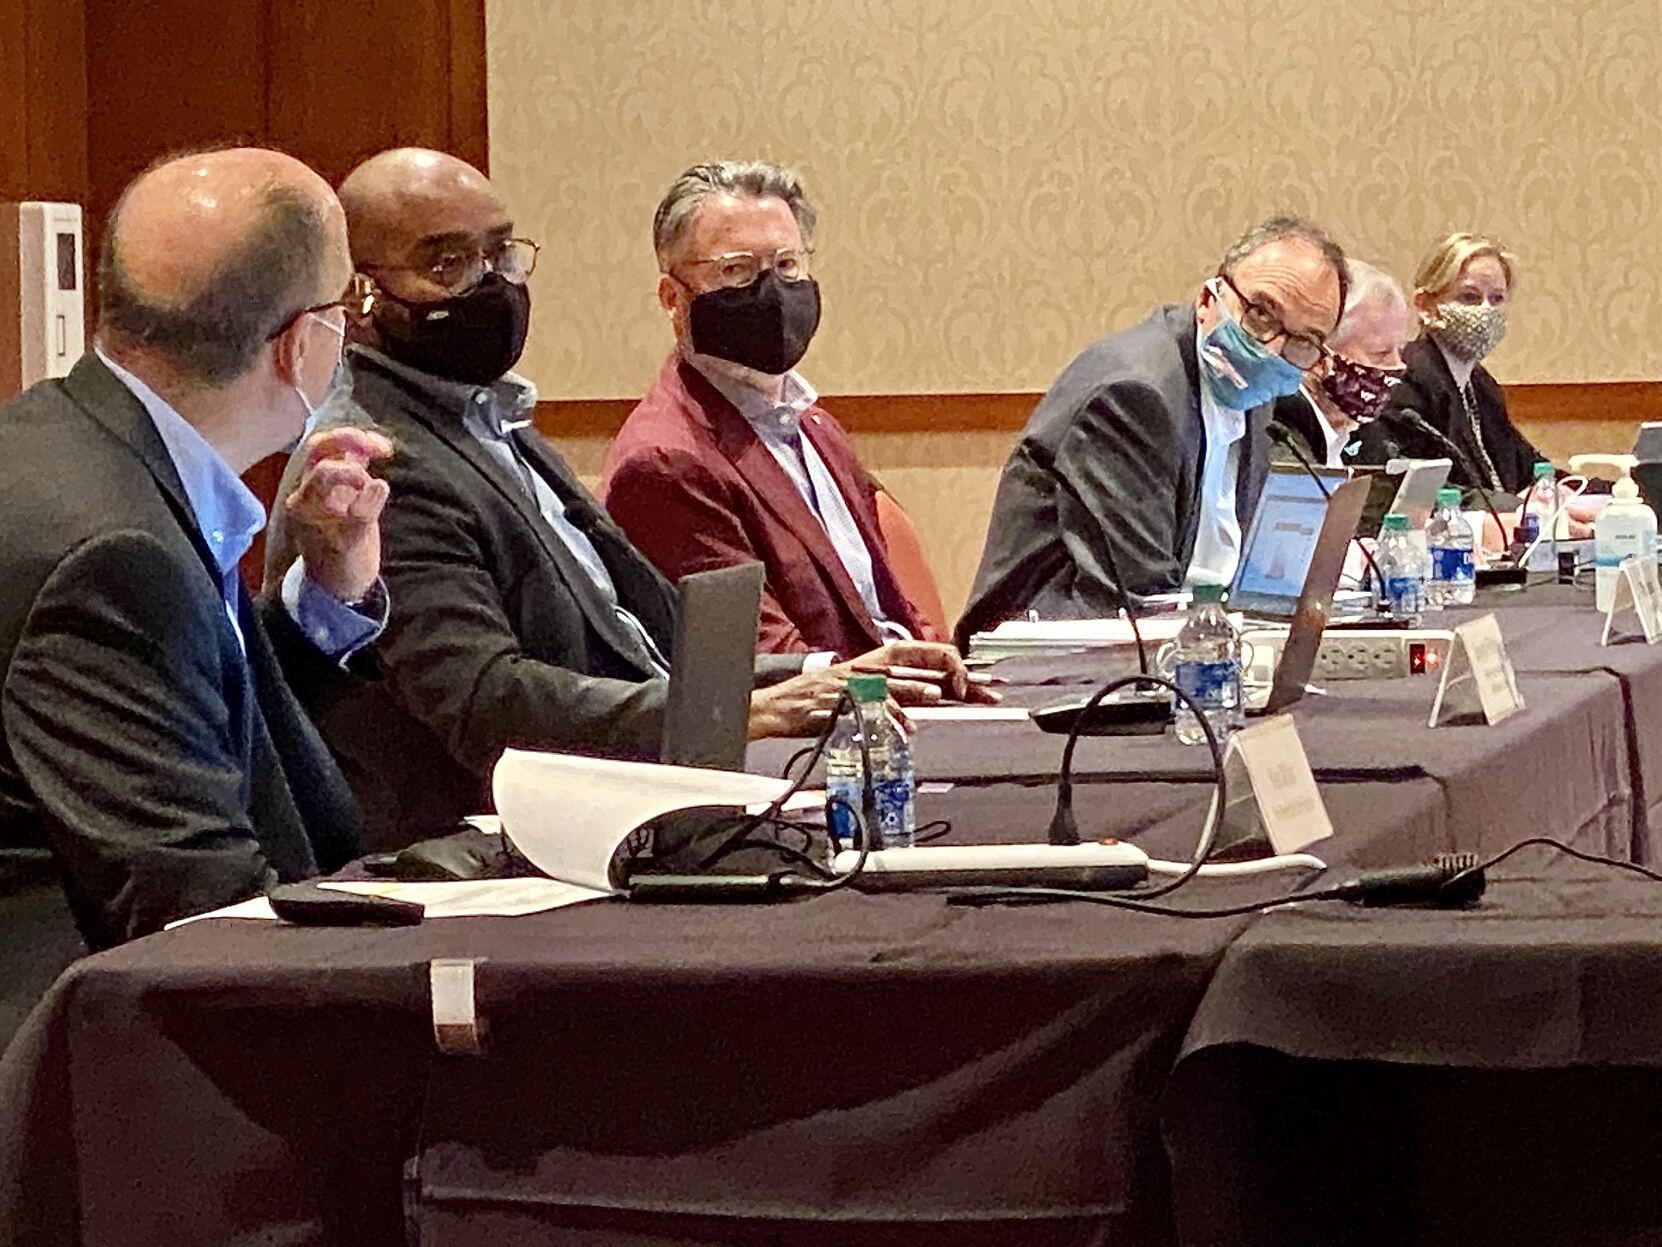 Virginia Tech Loses 60 Million As Pandemic Hits Budget Local News Roanoke Com